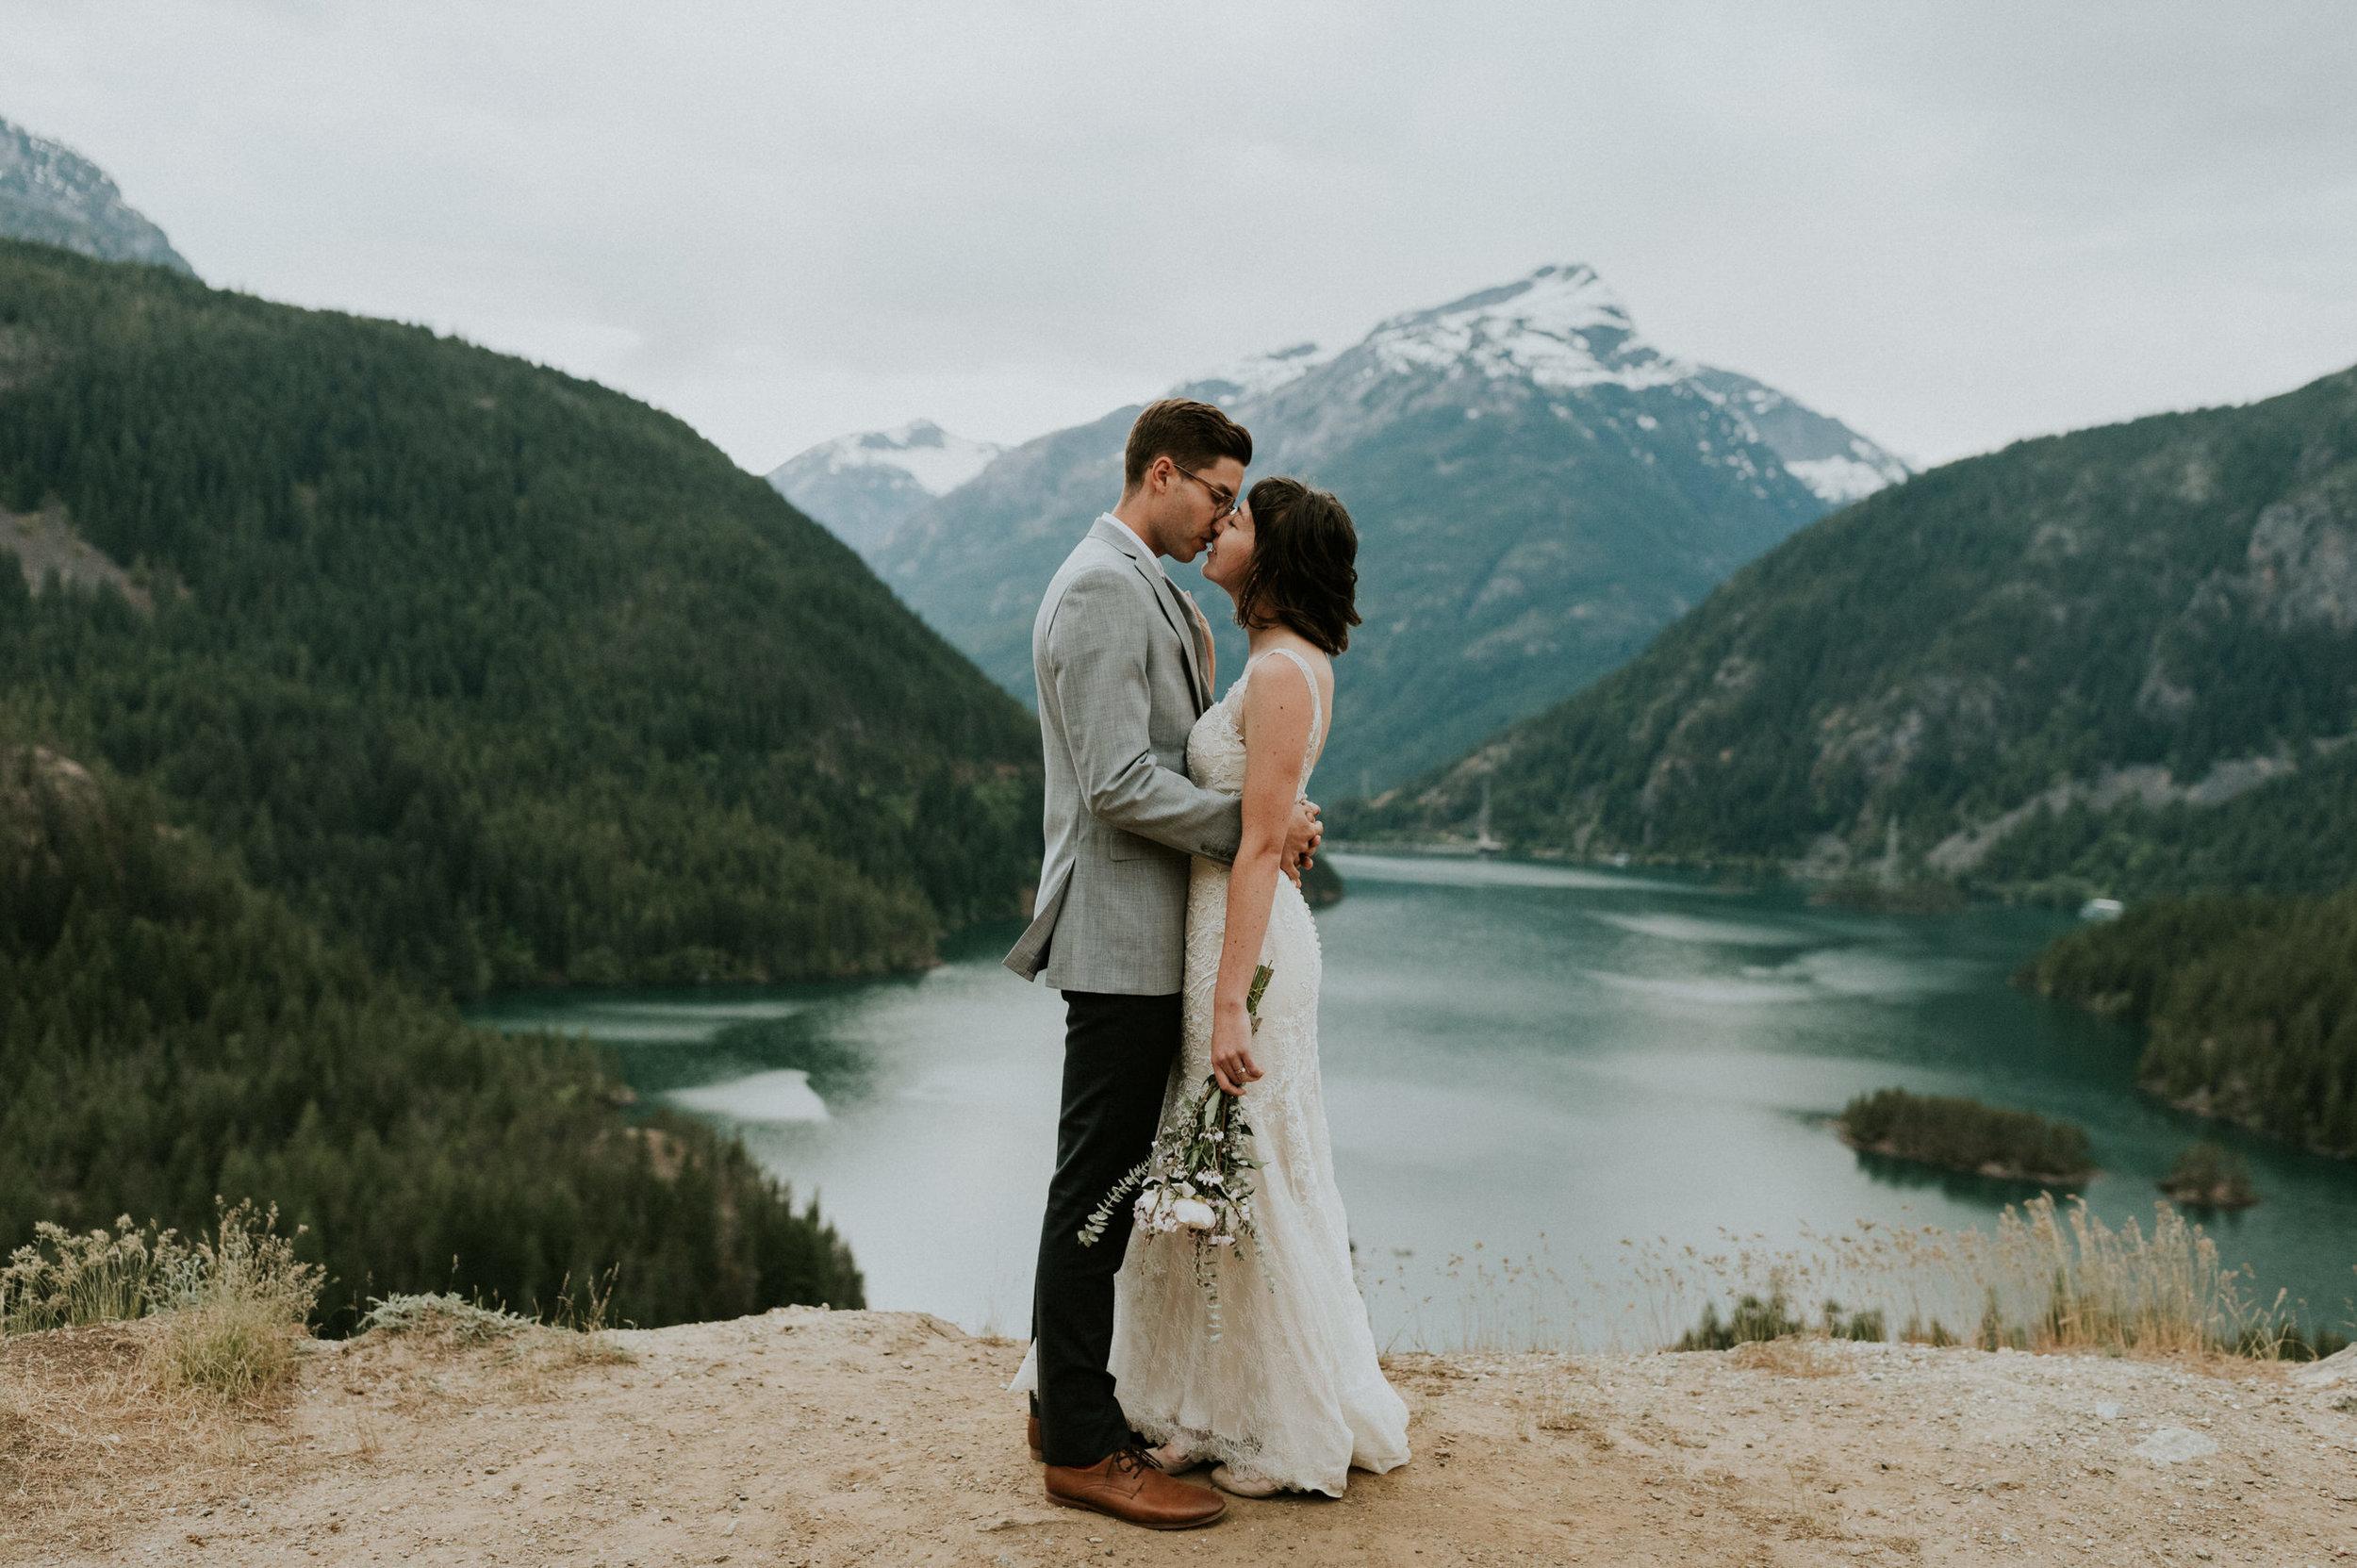 Ellie&Matt-wedding-seattle-diablolake24.jpg